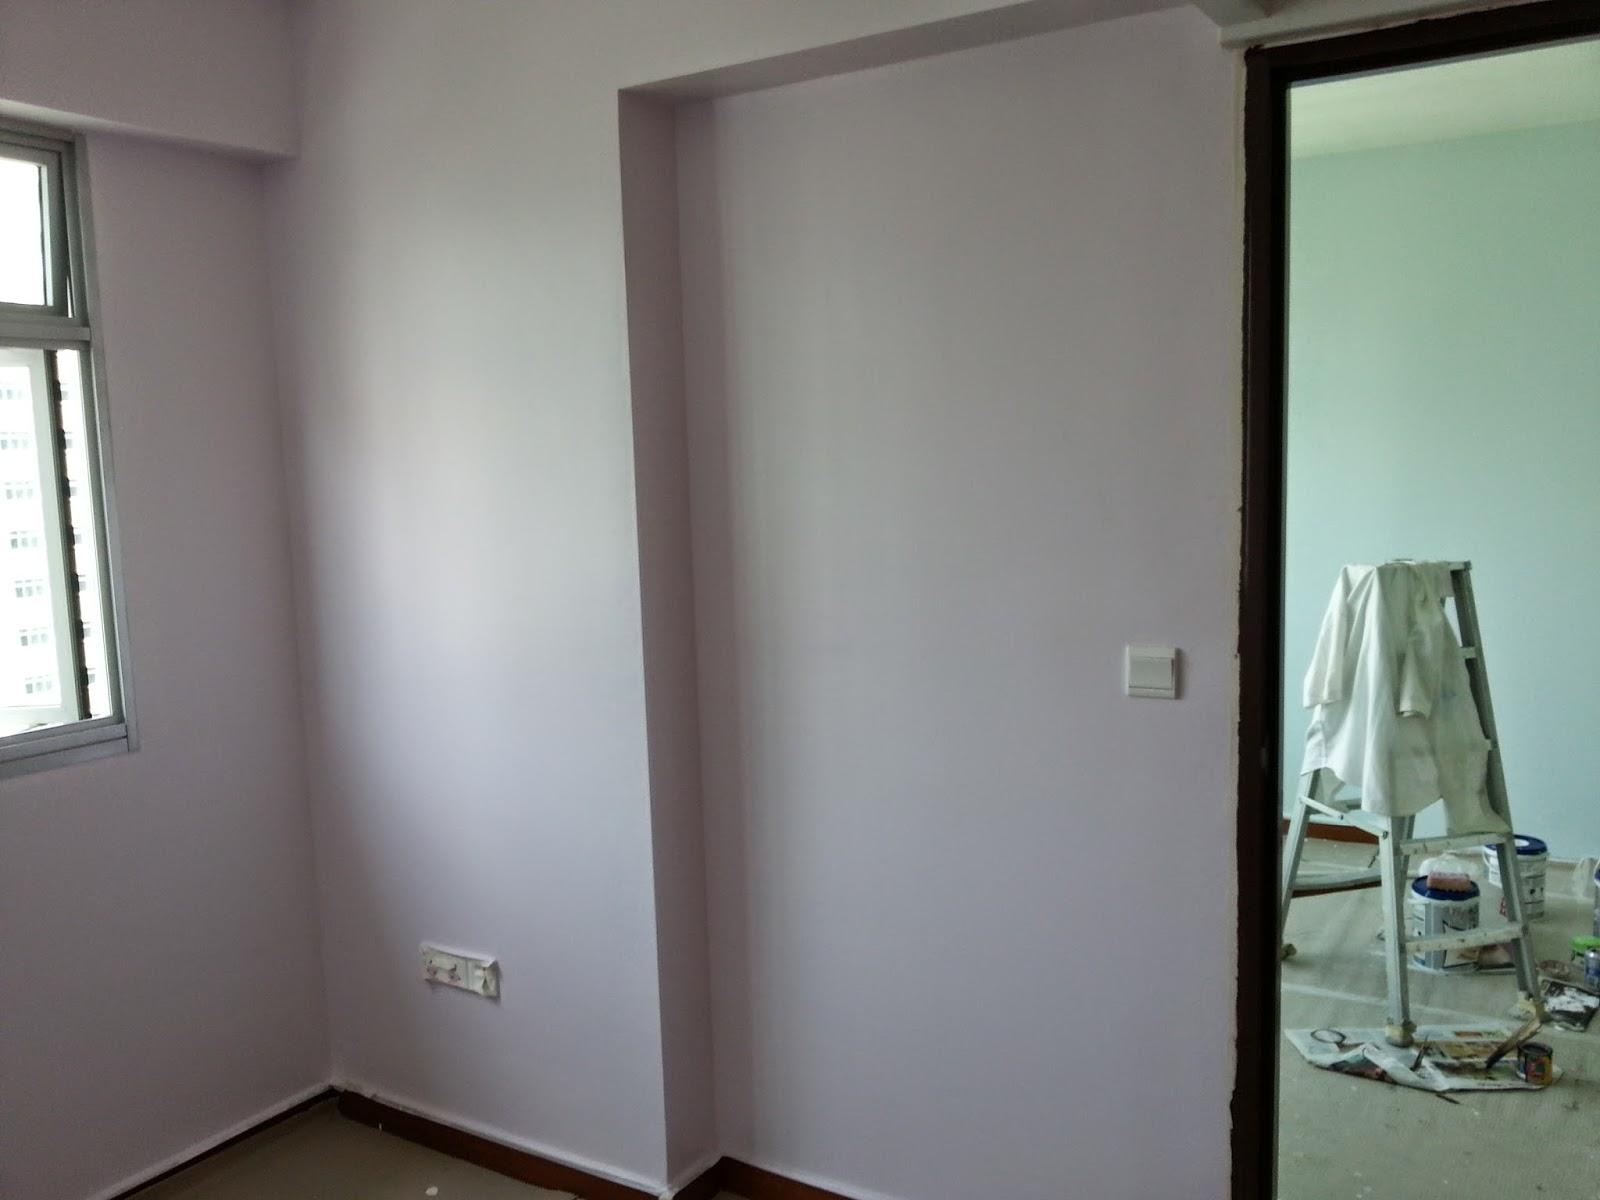 Hdb 2 Room Bto Renovation Small Space Big Ideas